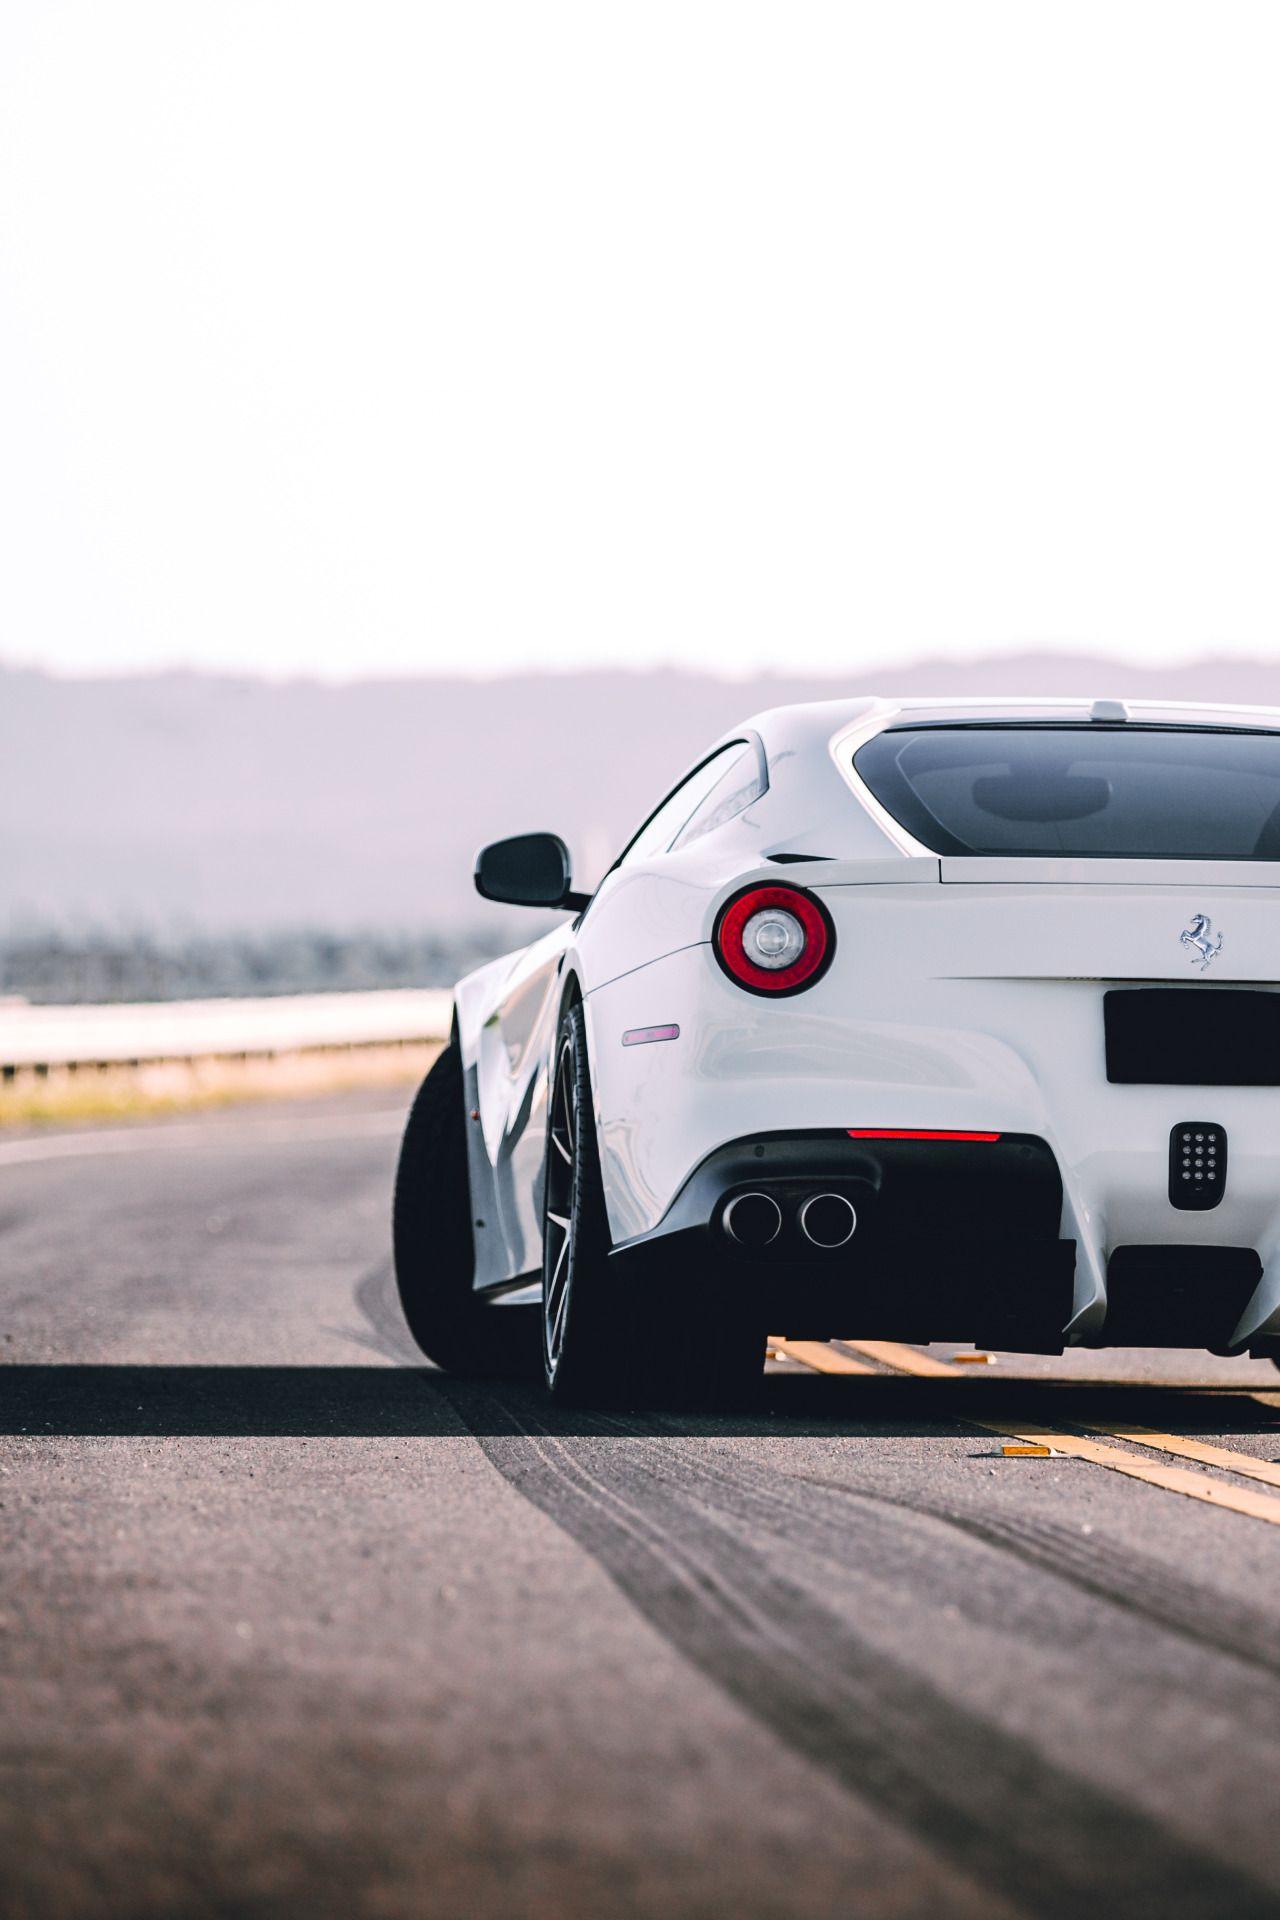 Guywithacamera415 Motivation Is Nonexistent Sports Cars Luxury Latest Cars White Ferrari